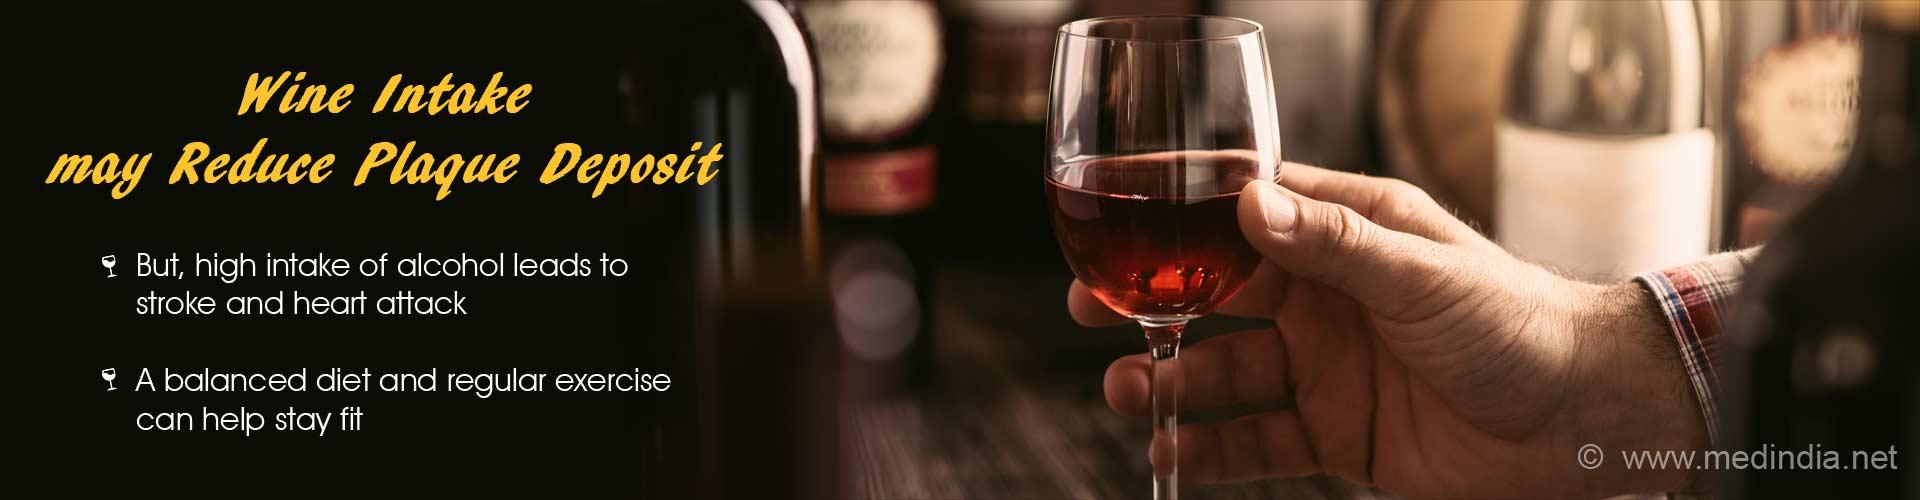 Wine may Reduce Plaque Build-up in Arteries of Diabetic Patients